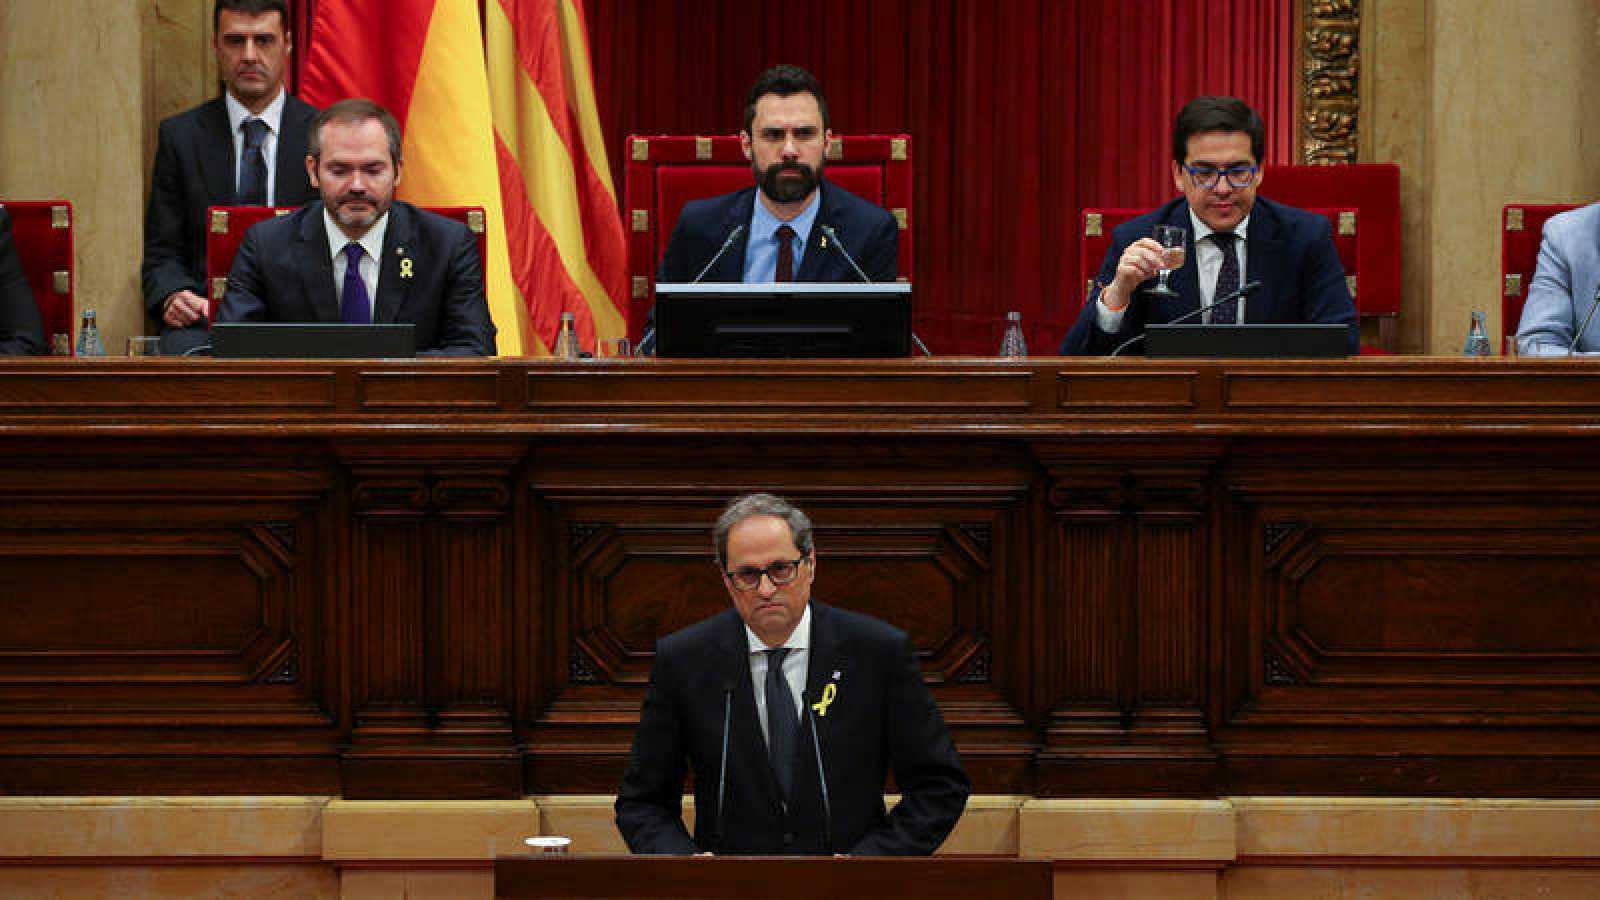 El candidato a presidente de la Generalitat, Quim Torra, con el presidente del Parlament catalán, Roger Torrent